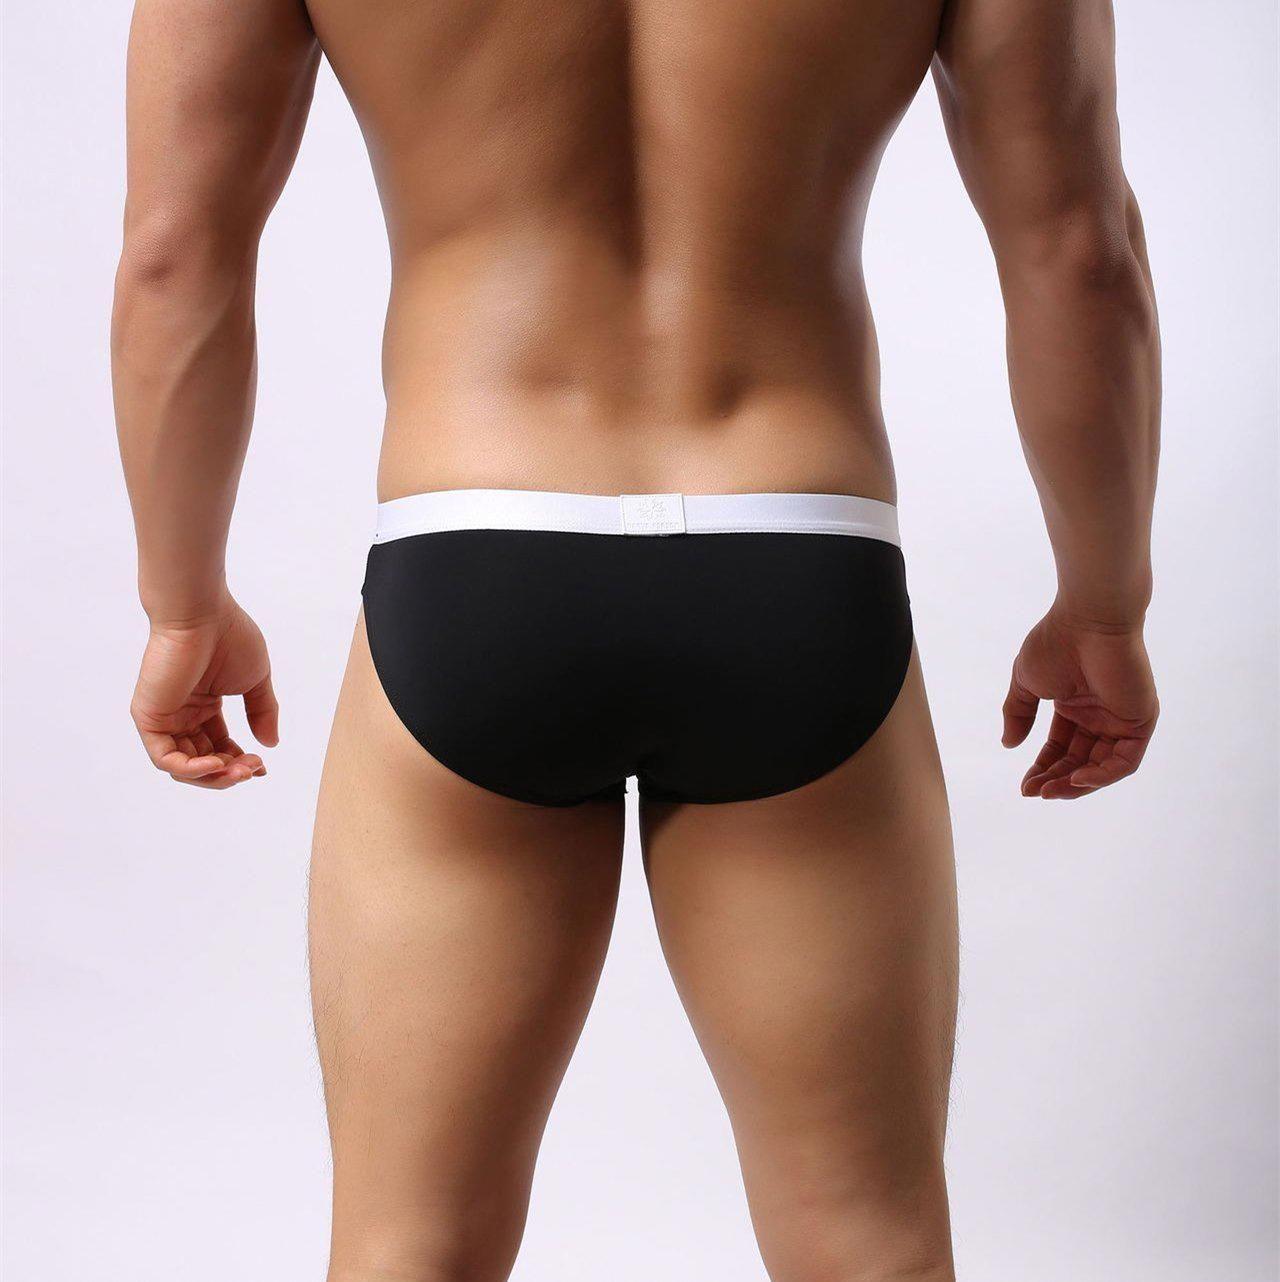 112831c9c5e2 Briefs & Boxers: Briefs Pattern Type: Solid Material: Nylon, Polyester  Fabrics: Nylon 80% and Spandex 20% Briefs: Bikini #howtobeabodybuilder